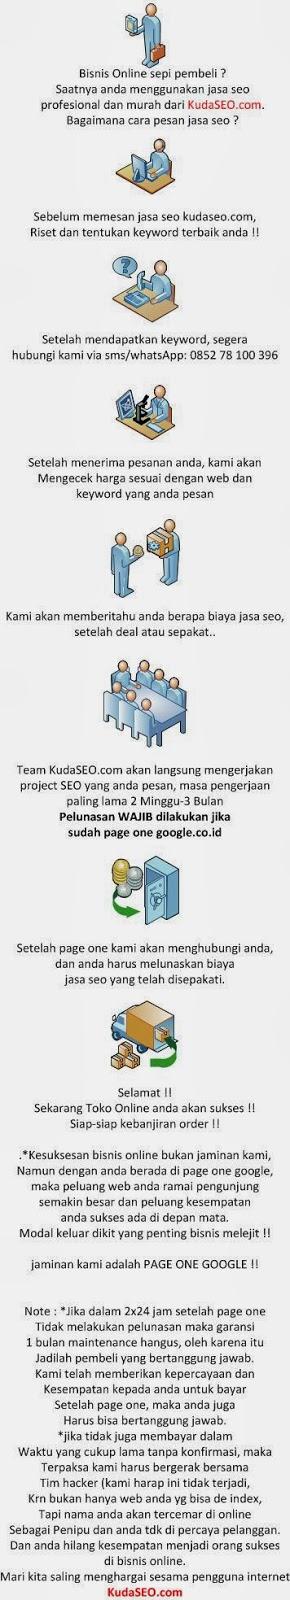 page one google. jasa seo,jasa seo profesional,jasa seo berkualitas, jasa seo murah, jasa seo garansi, pakar seo, konsultan seo, hanya di kudaseo.com,pakar seo berry hardisakha